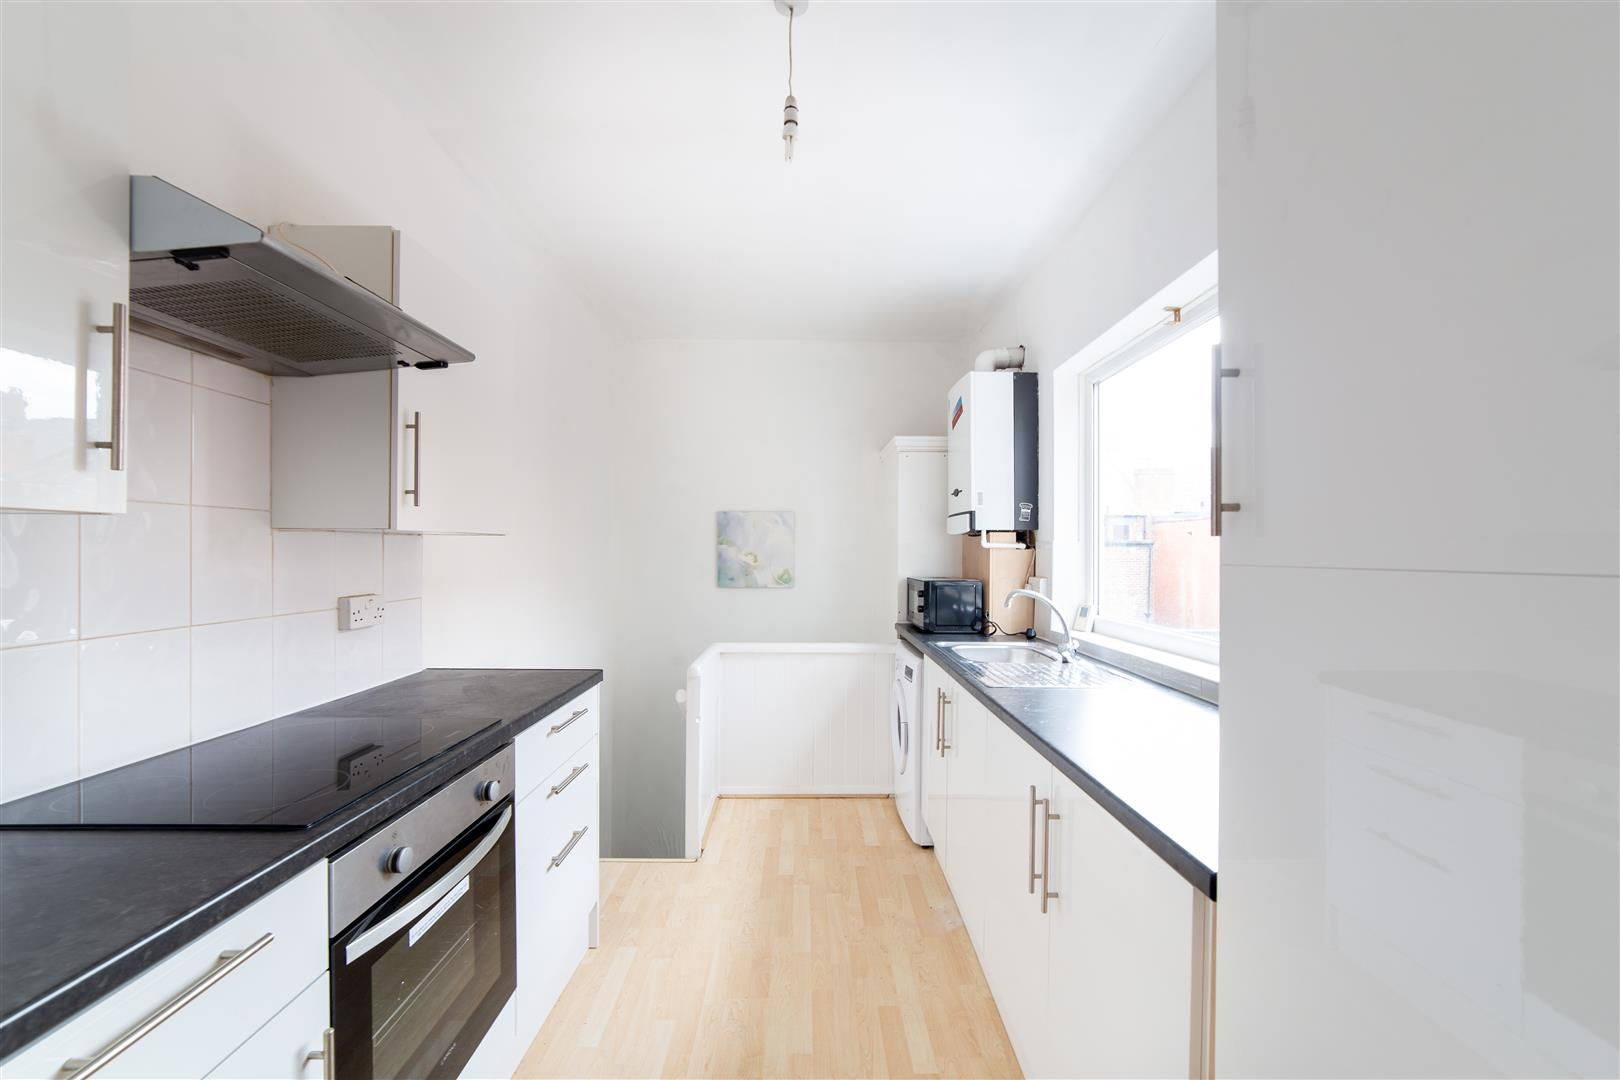 3 bed flat to rent in Newcastle Upon Tyne, NE6 5LS, NE6